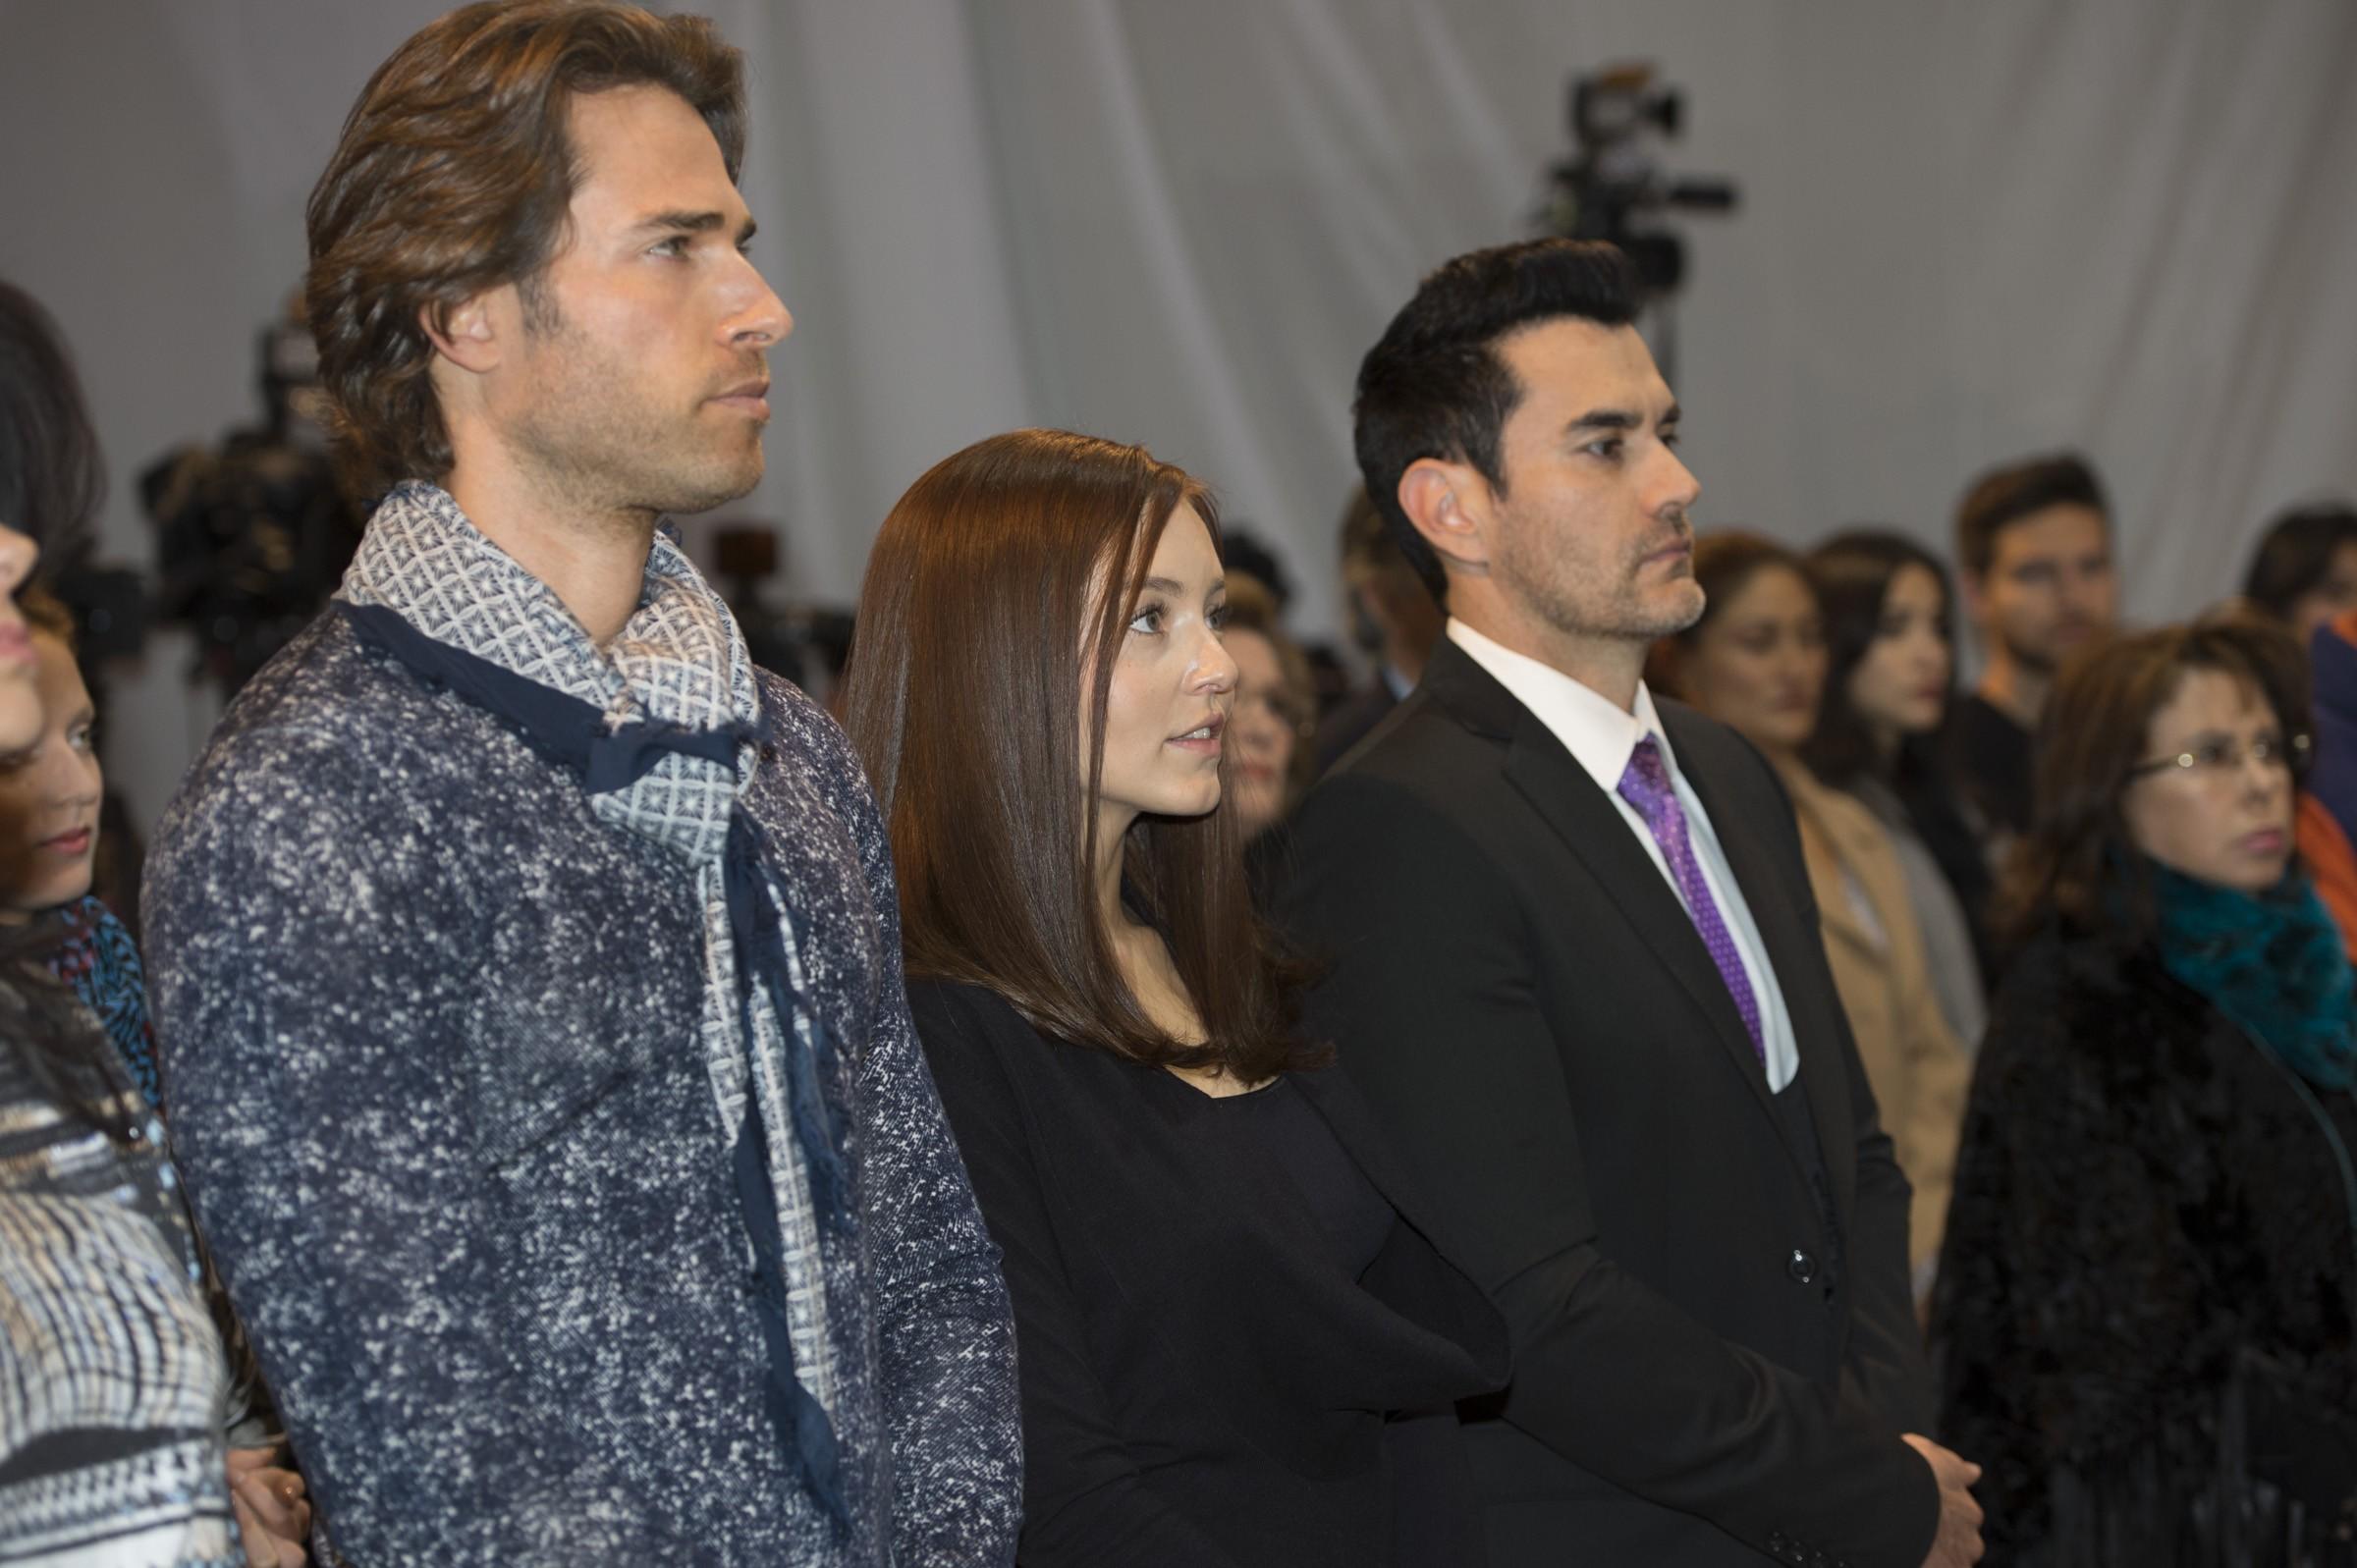 Angelique Boyer y Sebastian Rulli, ¿son novios?